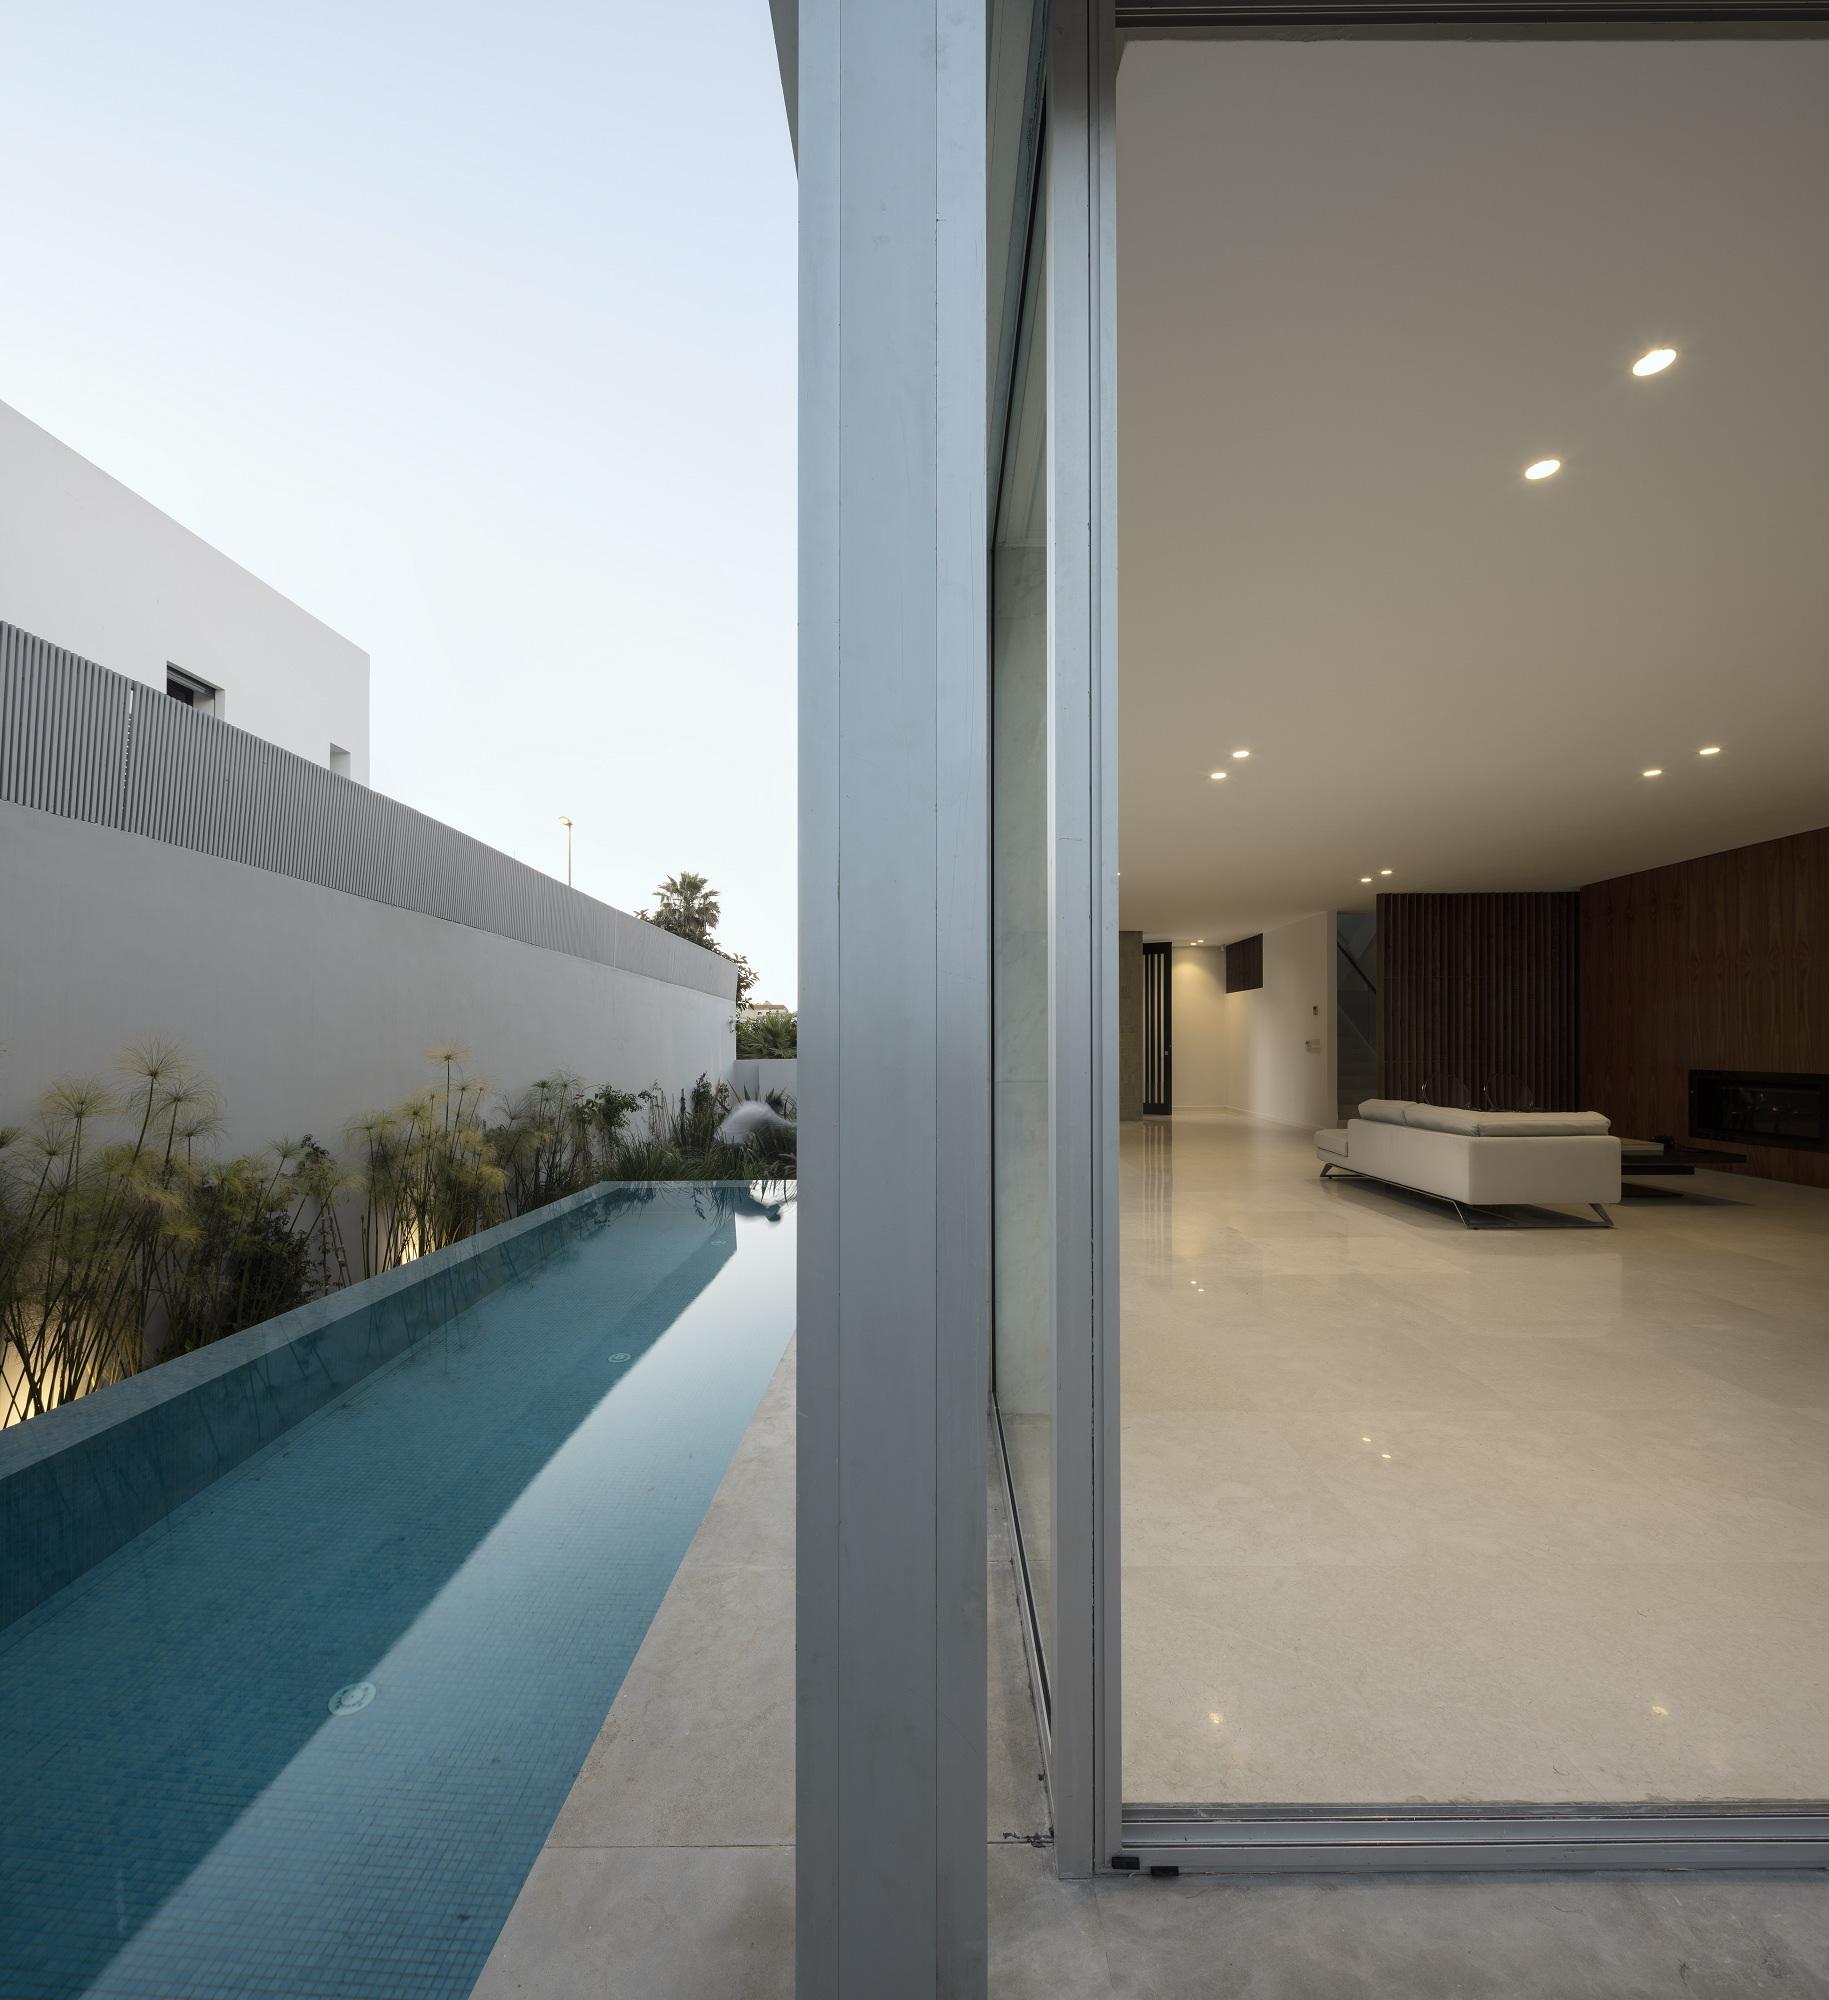 Villa Agava par Driss Kettani sur Design Maroc